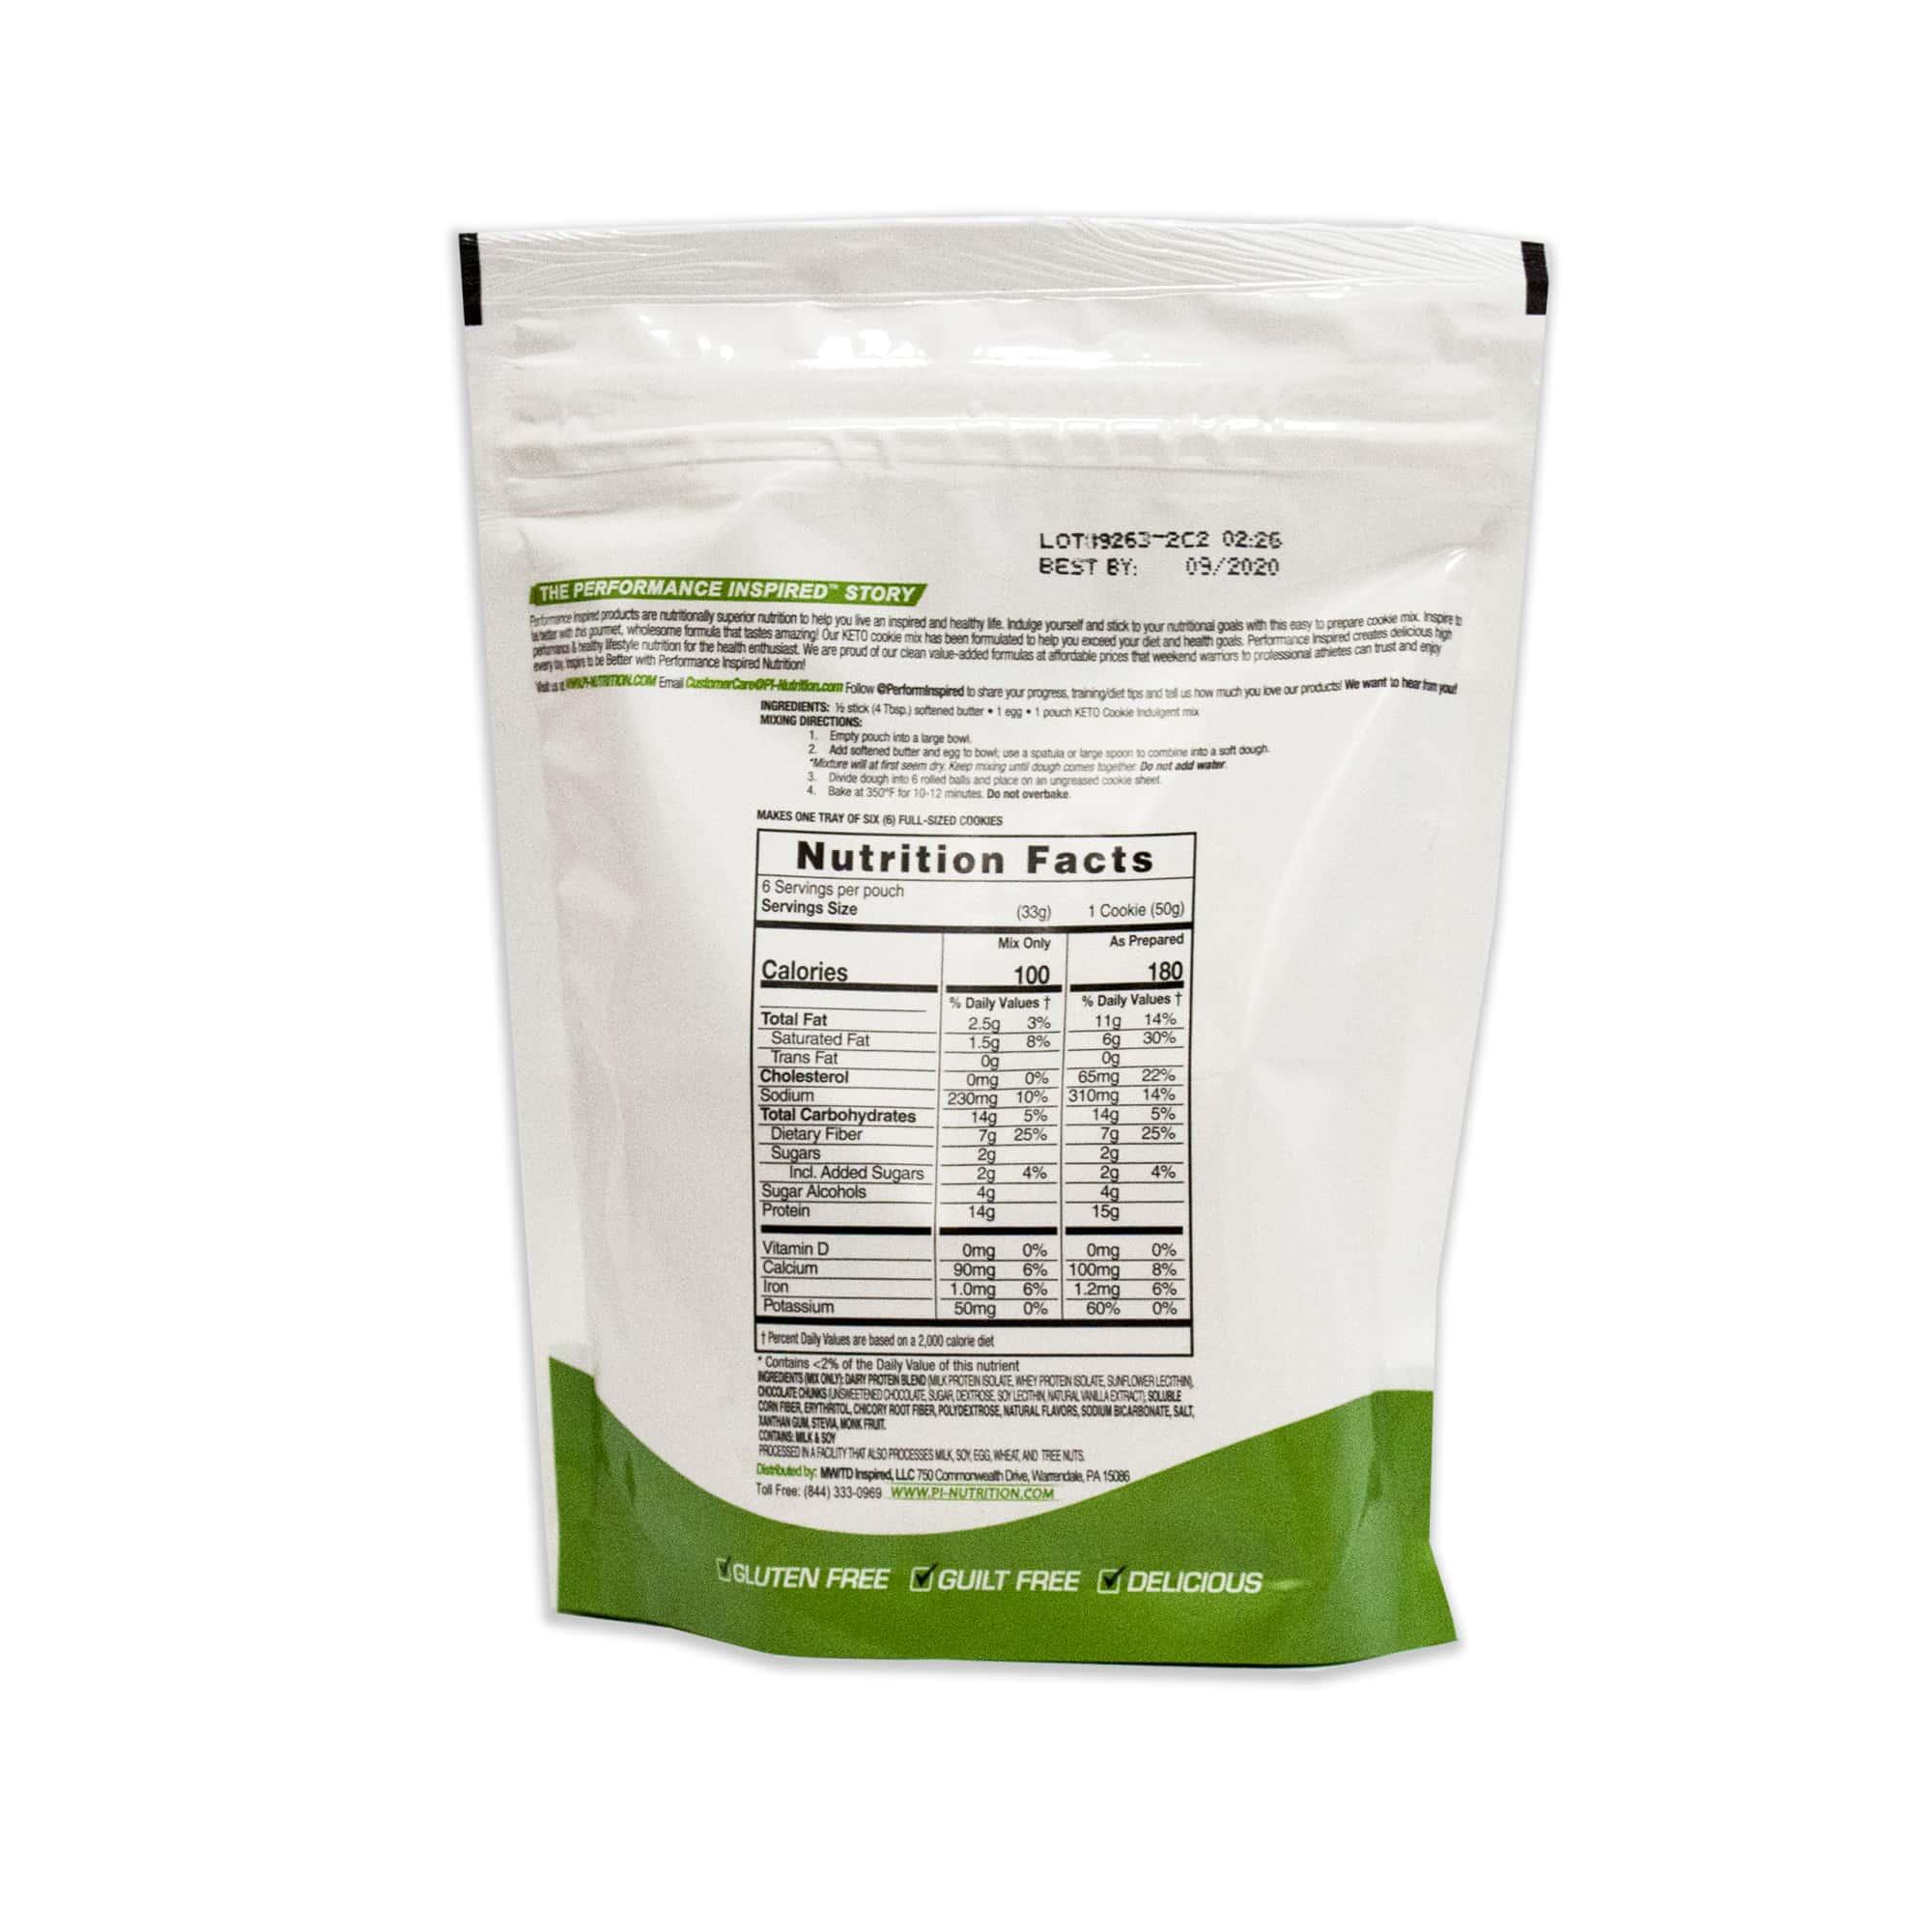 Keto Friendly cookie mix bag back